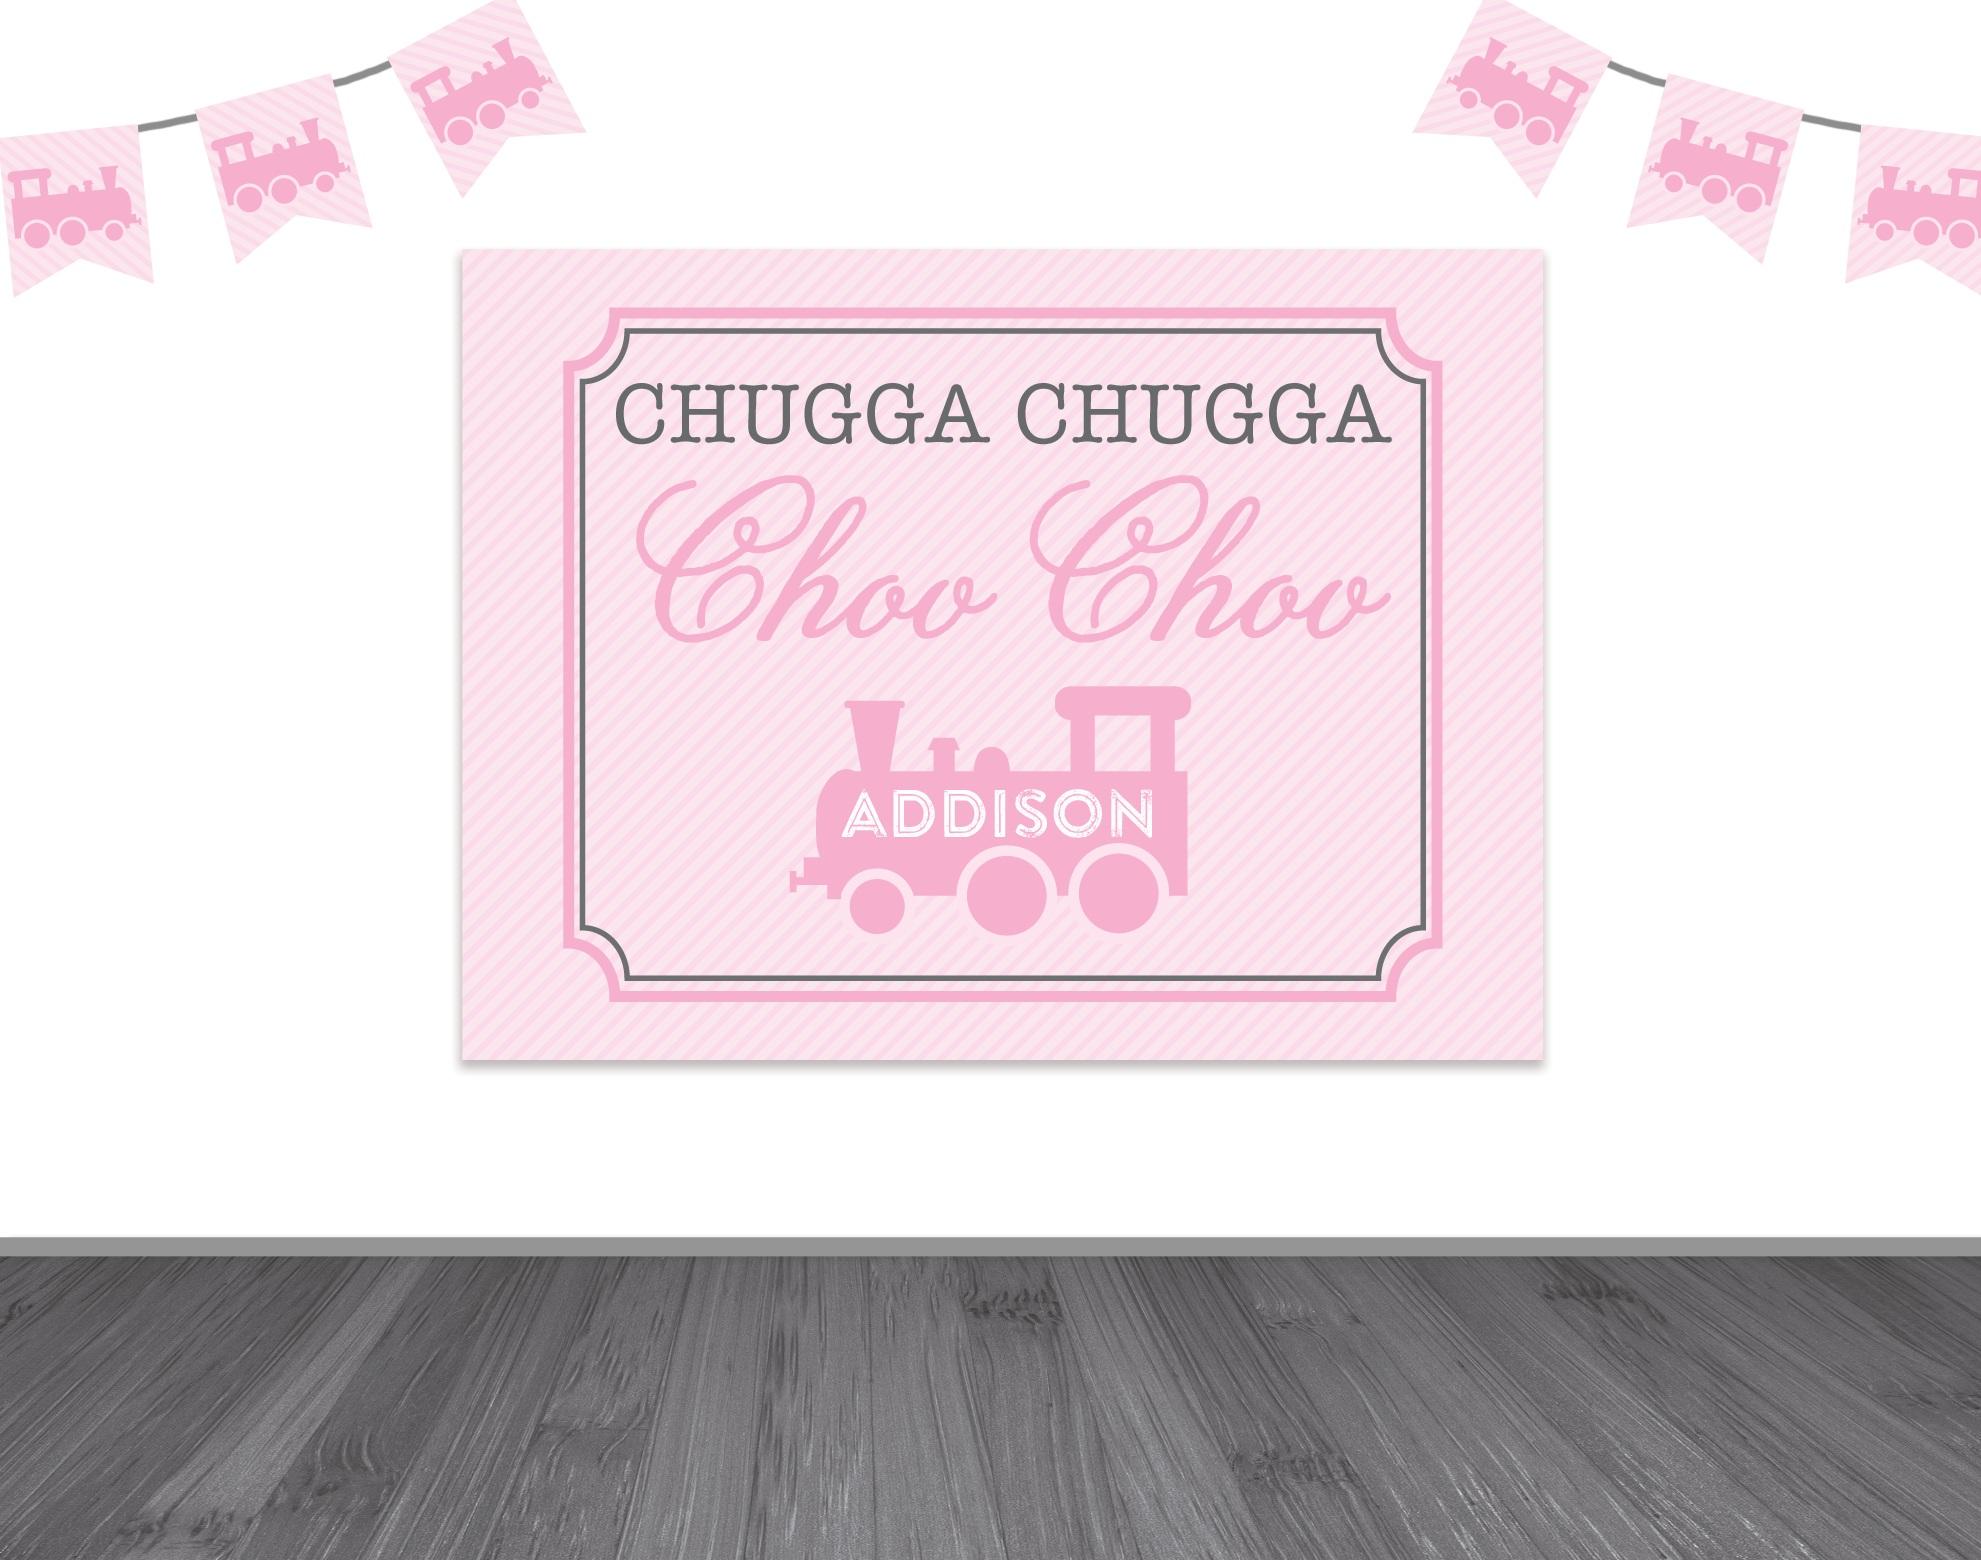 chugga chugga two two backdrop